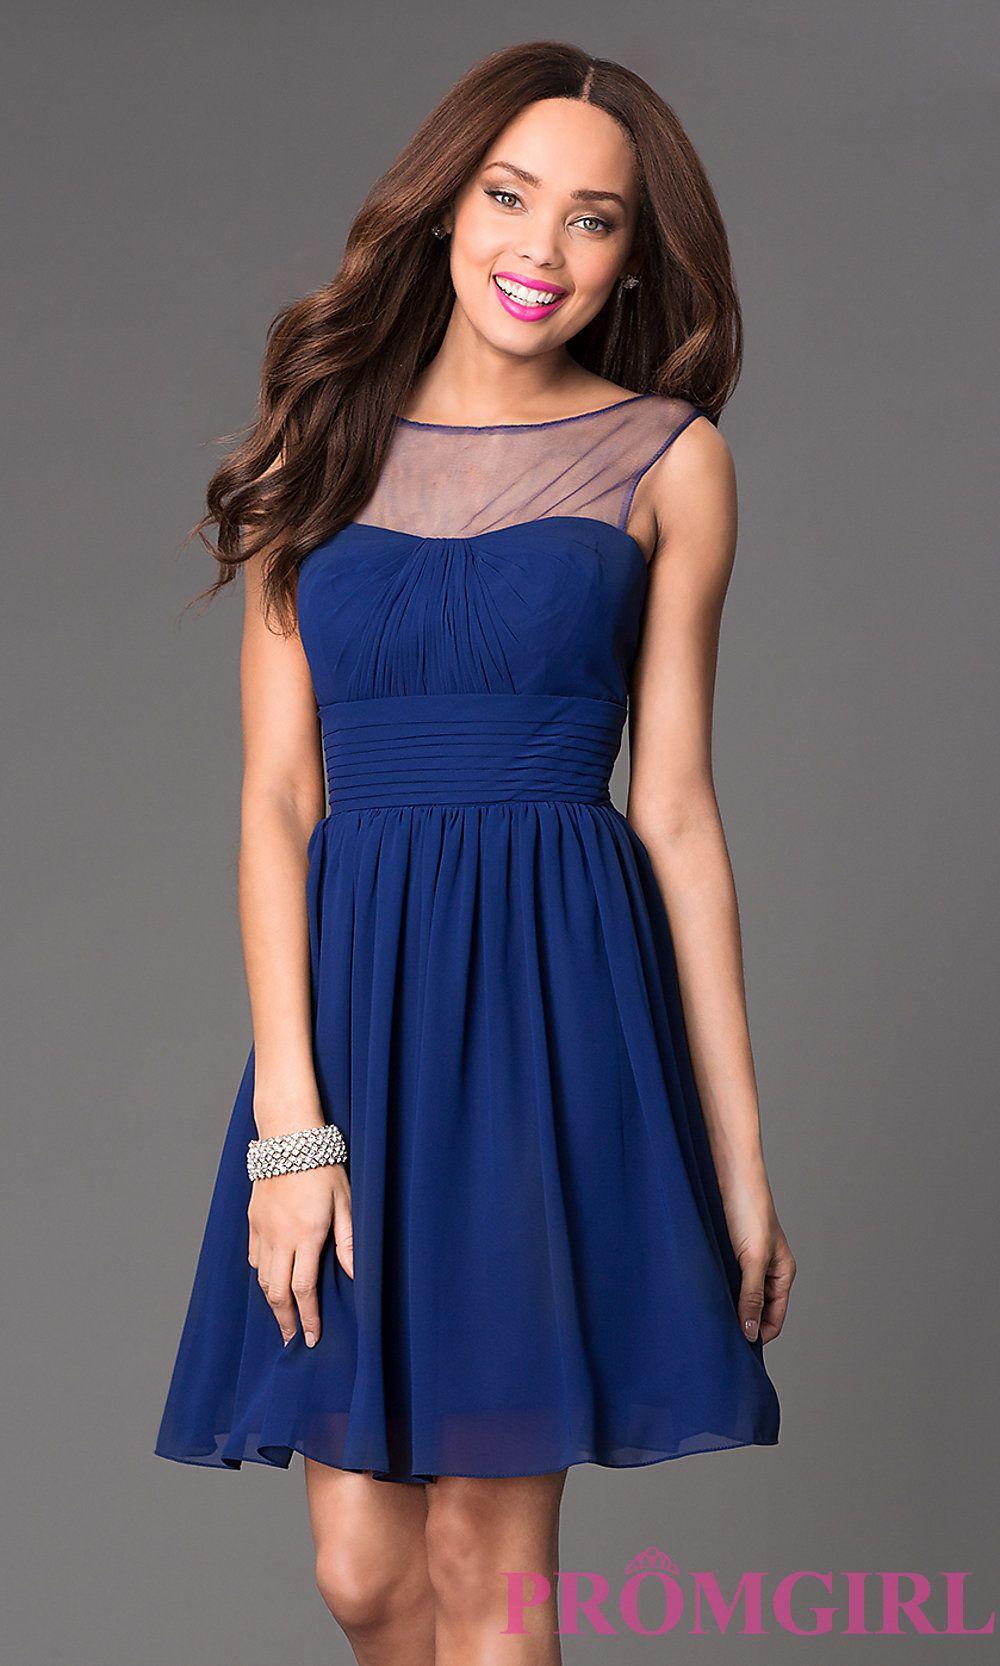 Formal Dresses in Kentucky